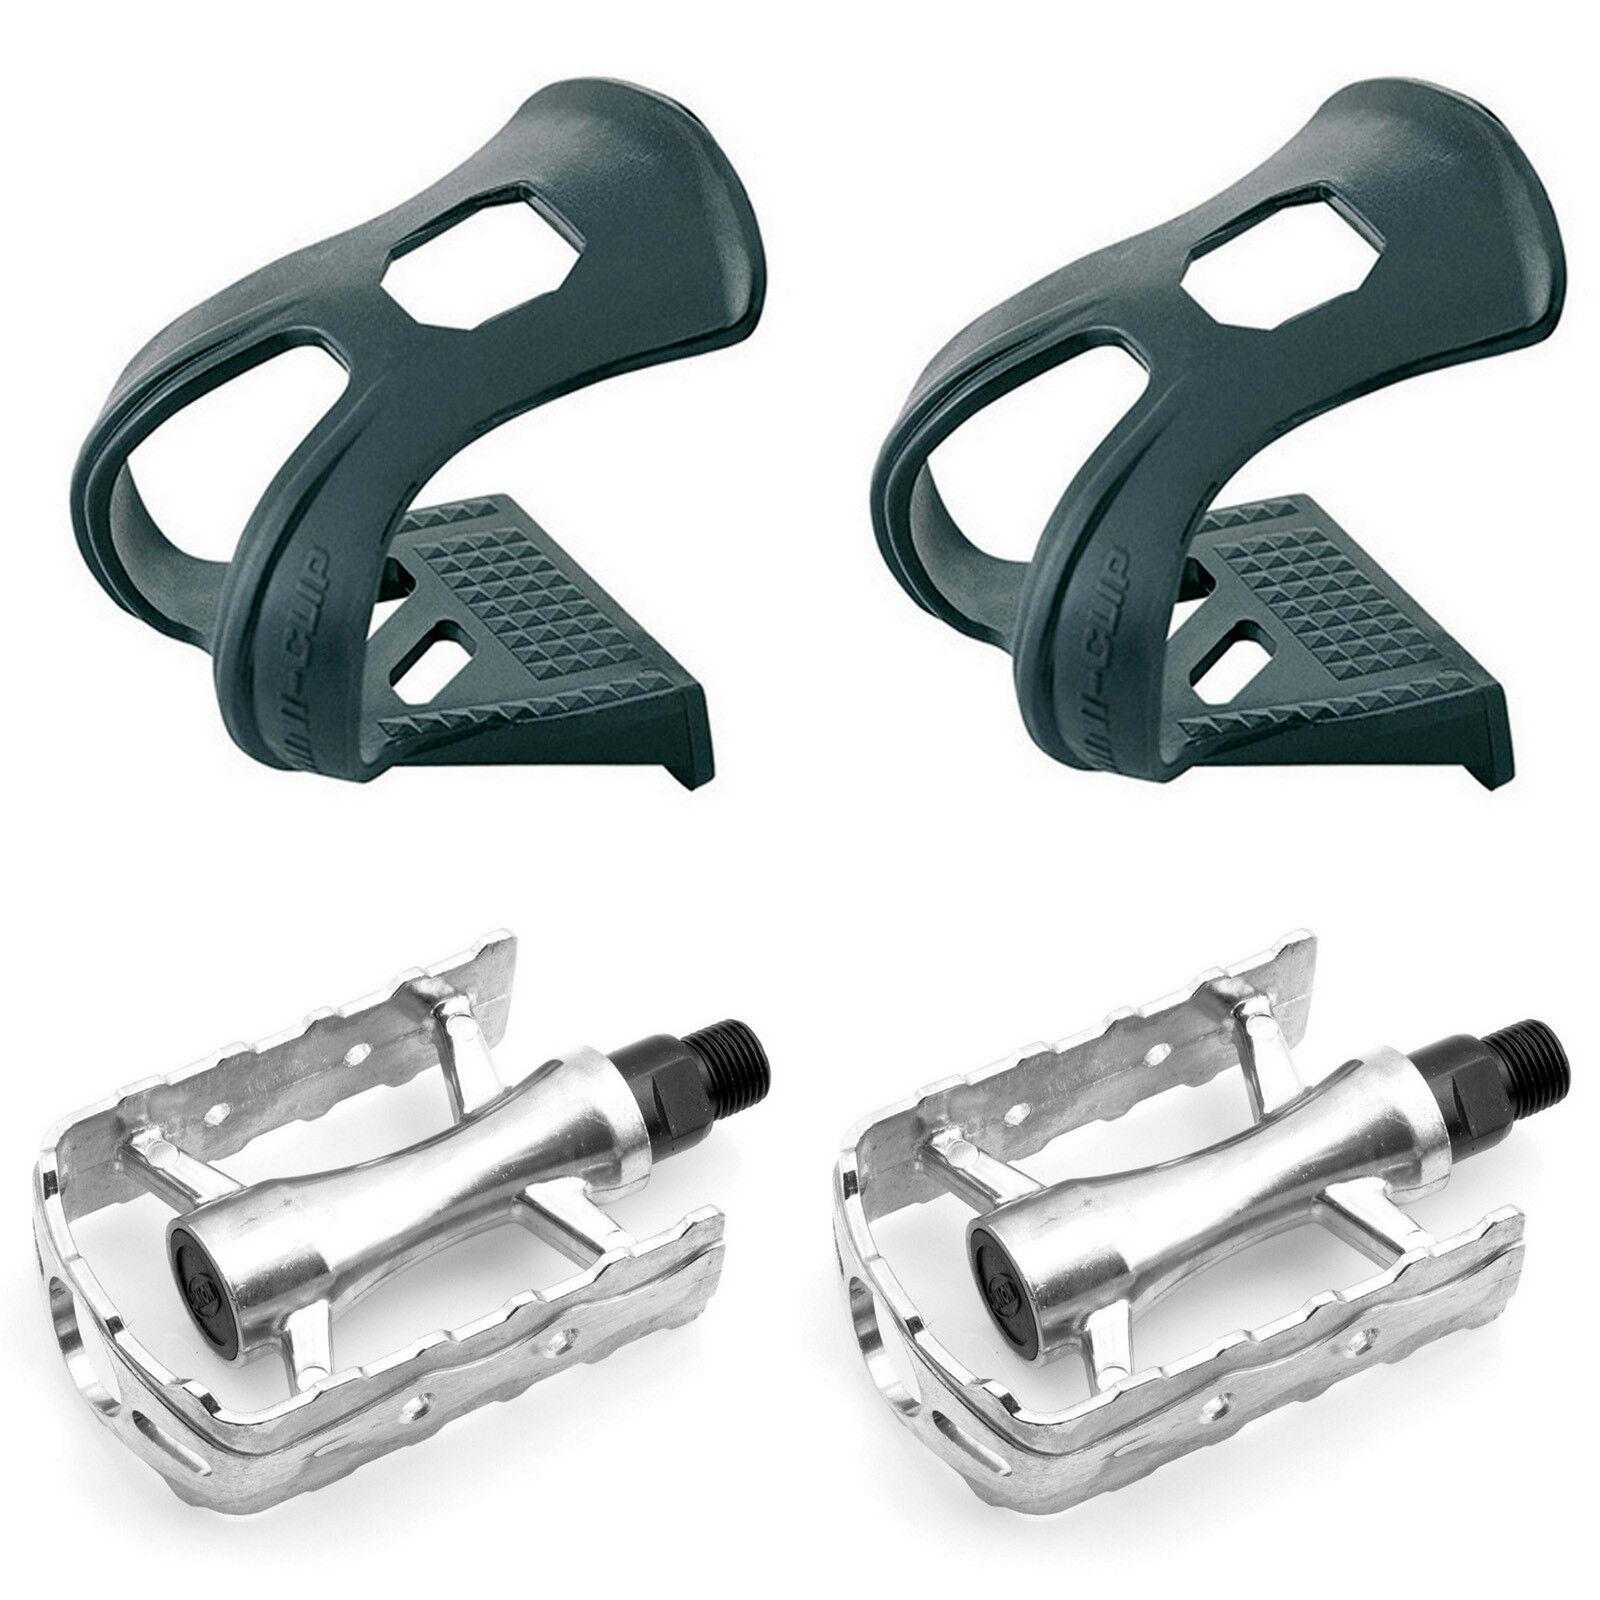 Pedales Retro Vintage Plata Aluminio Eje de Cromo Bicicleta + Calapies 3194bpl